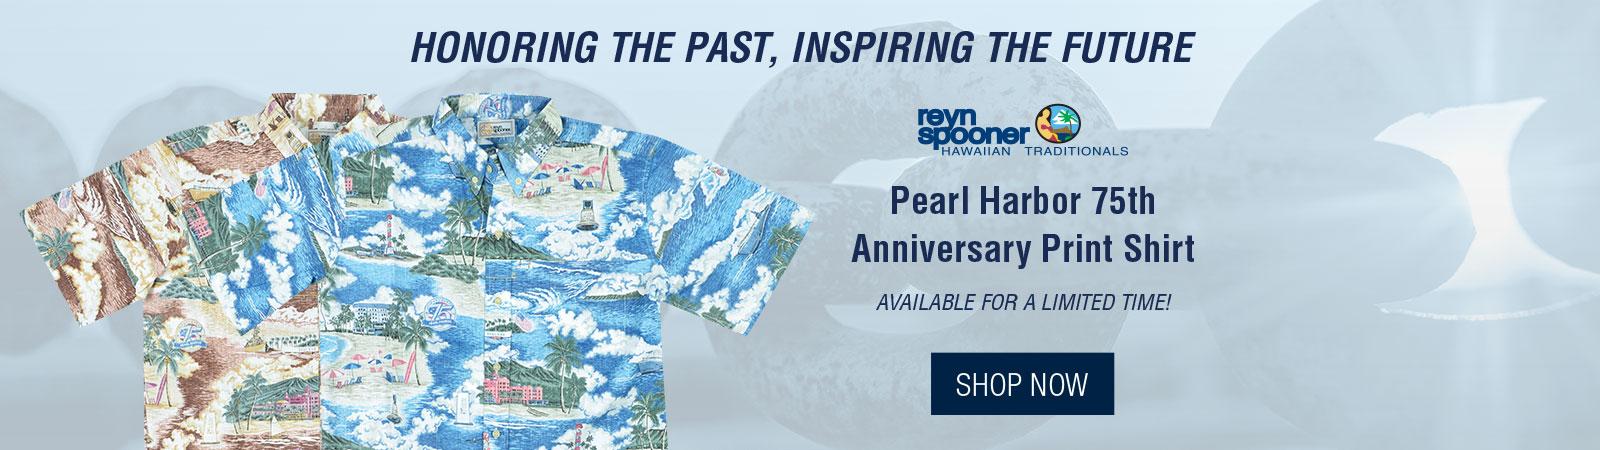 Pearl Harbor 75th Anniversary Print Shirt